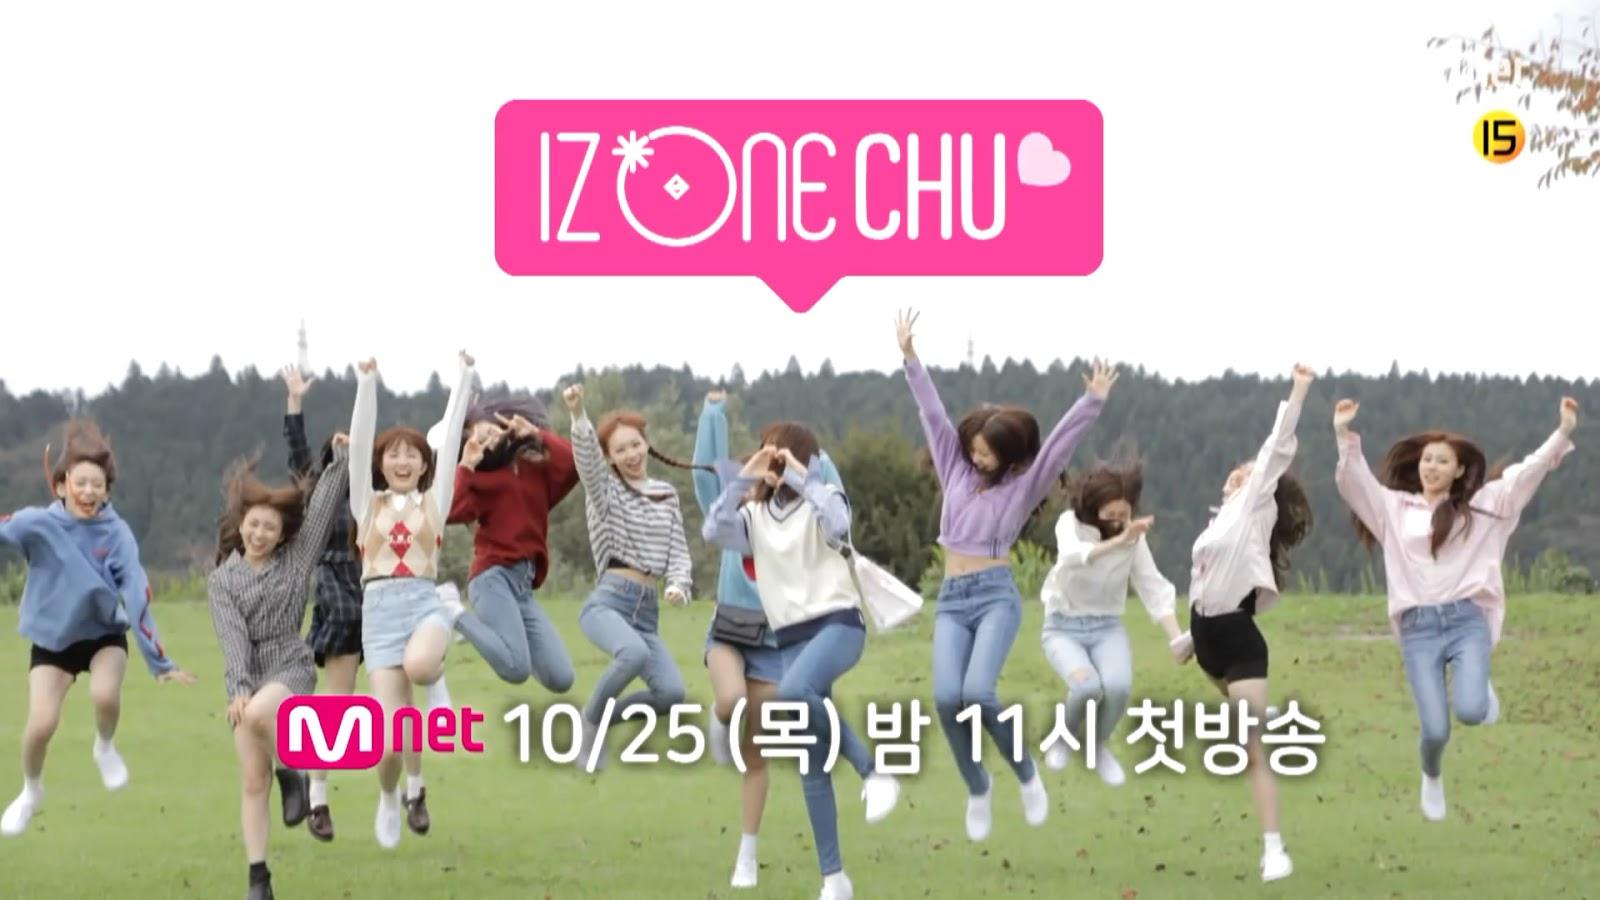 download izone chu season 2 episode 1 sub indo